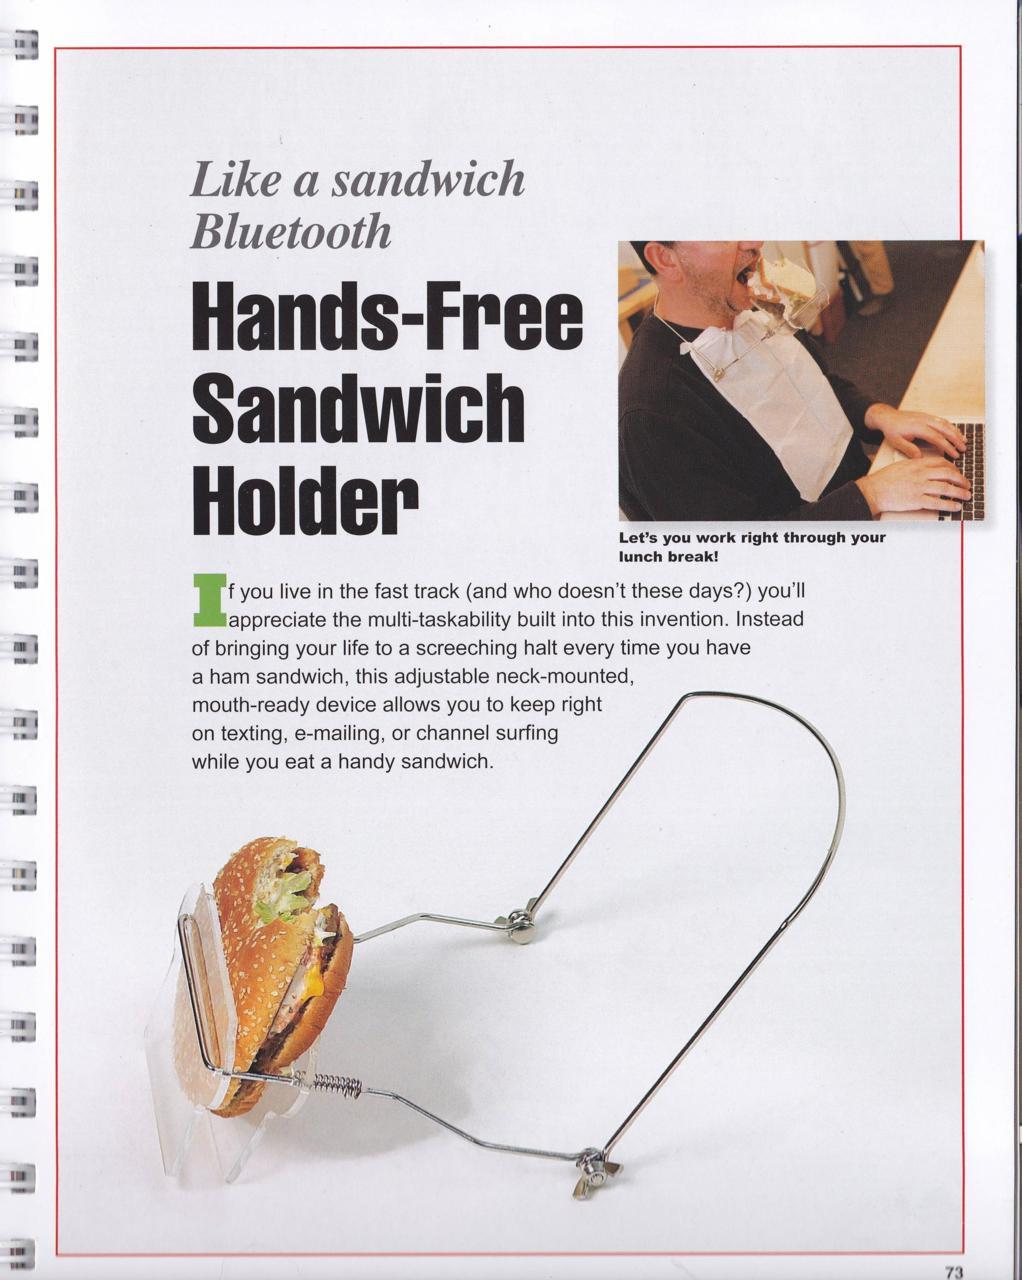 Hands-Free Sandwich Holder Concept Design